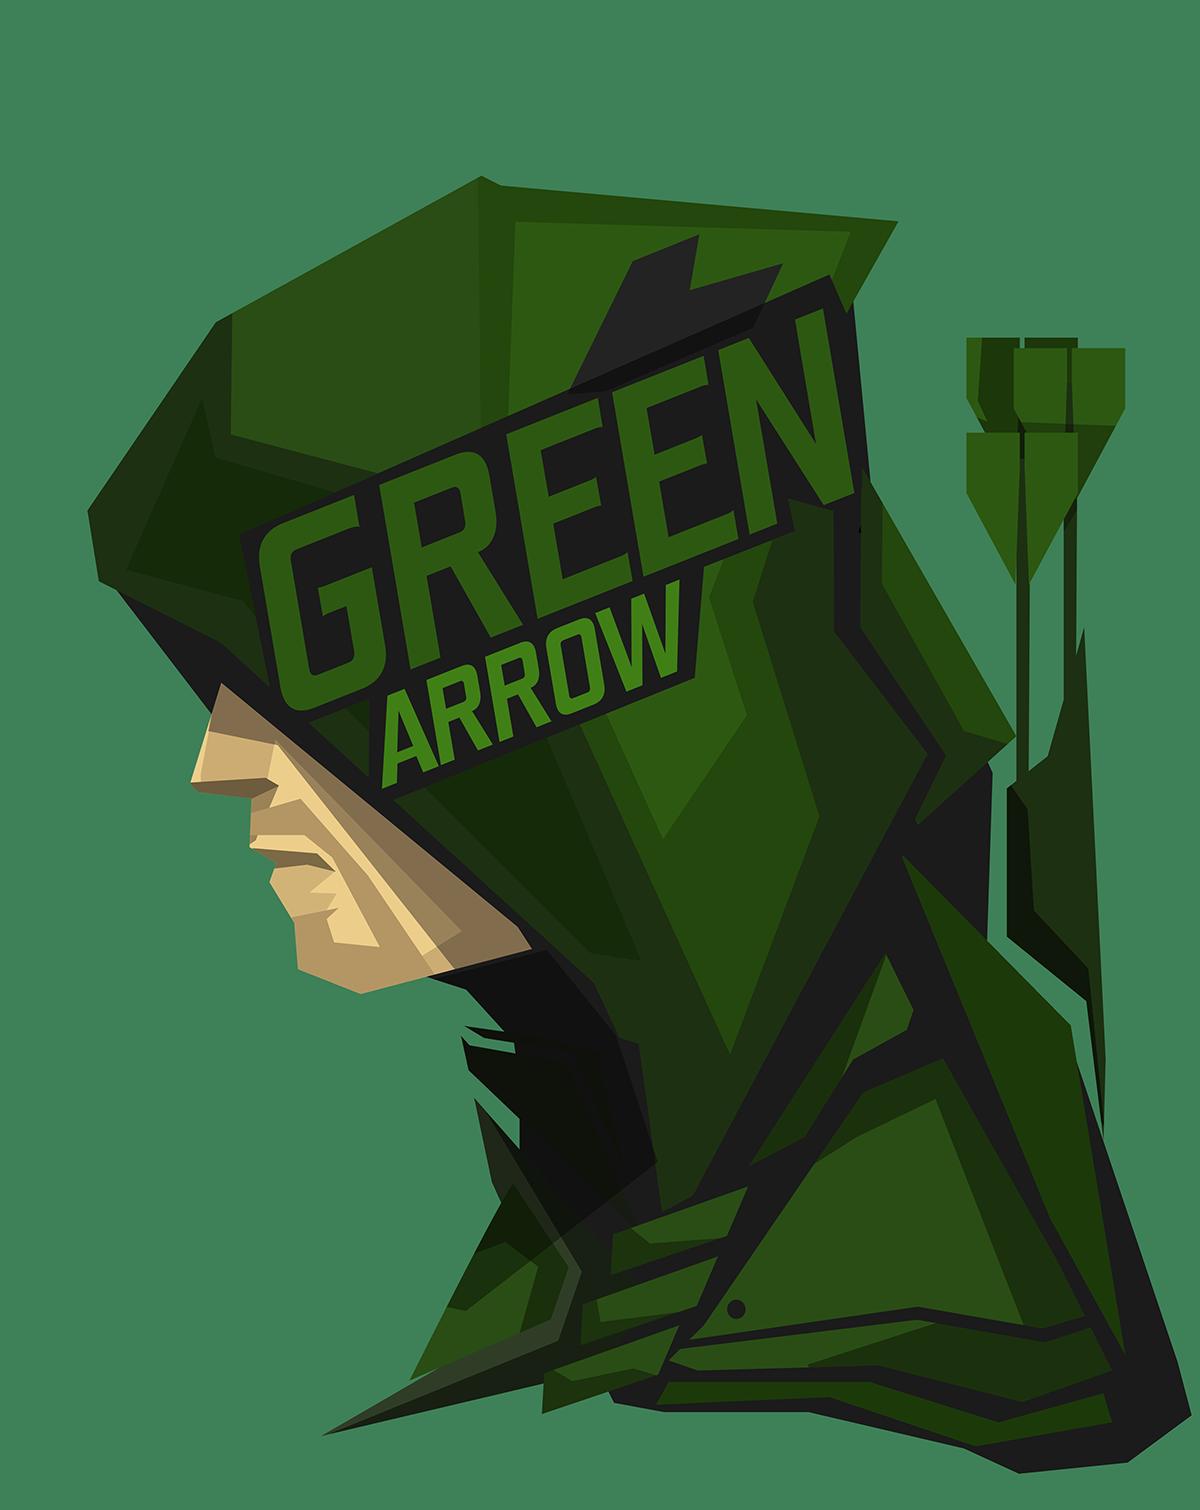 Pop Culture Stylized Head Shots Of Some Of My Fav Characters And People Green Arrow Superhero Pop Art Dc Comics Art